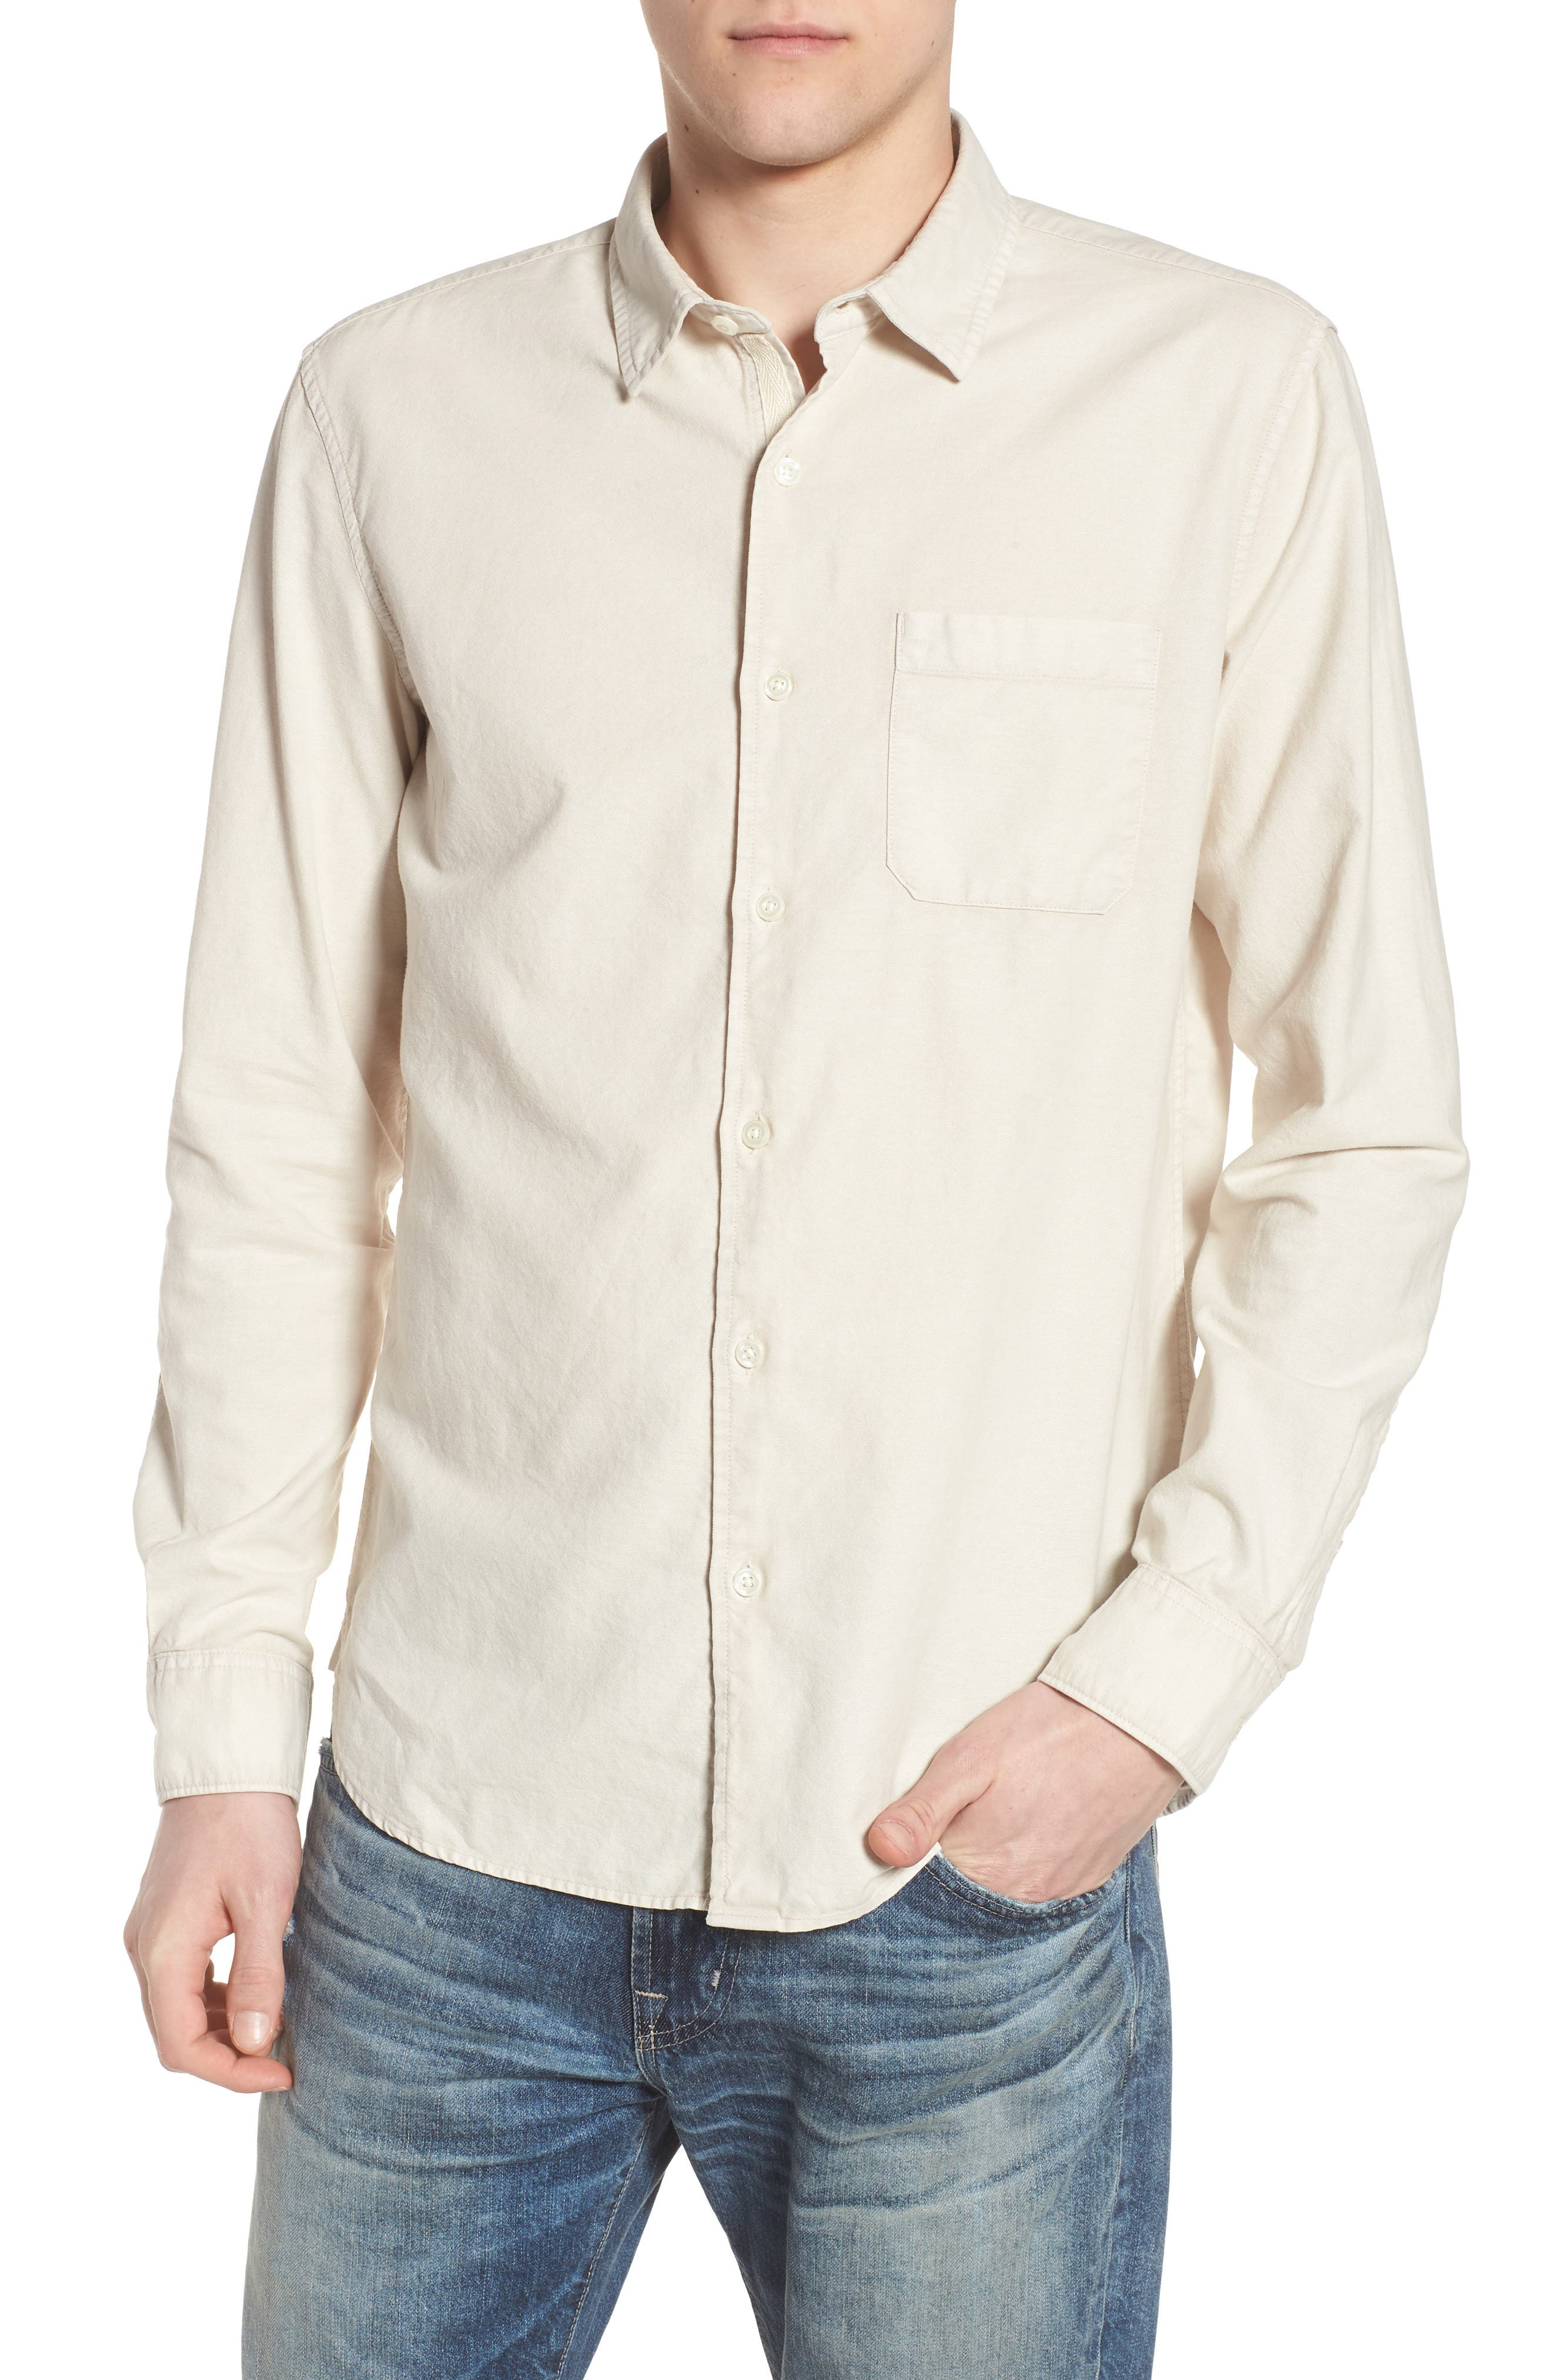 Bristol Slim Fit Sport Shirt,                         Main,                         color, Sunbaked Mineral Veil